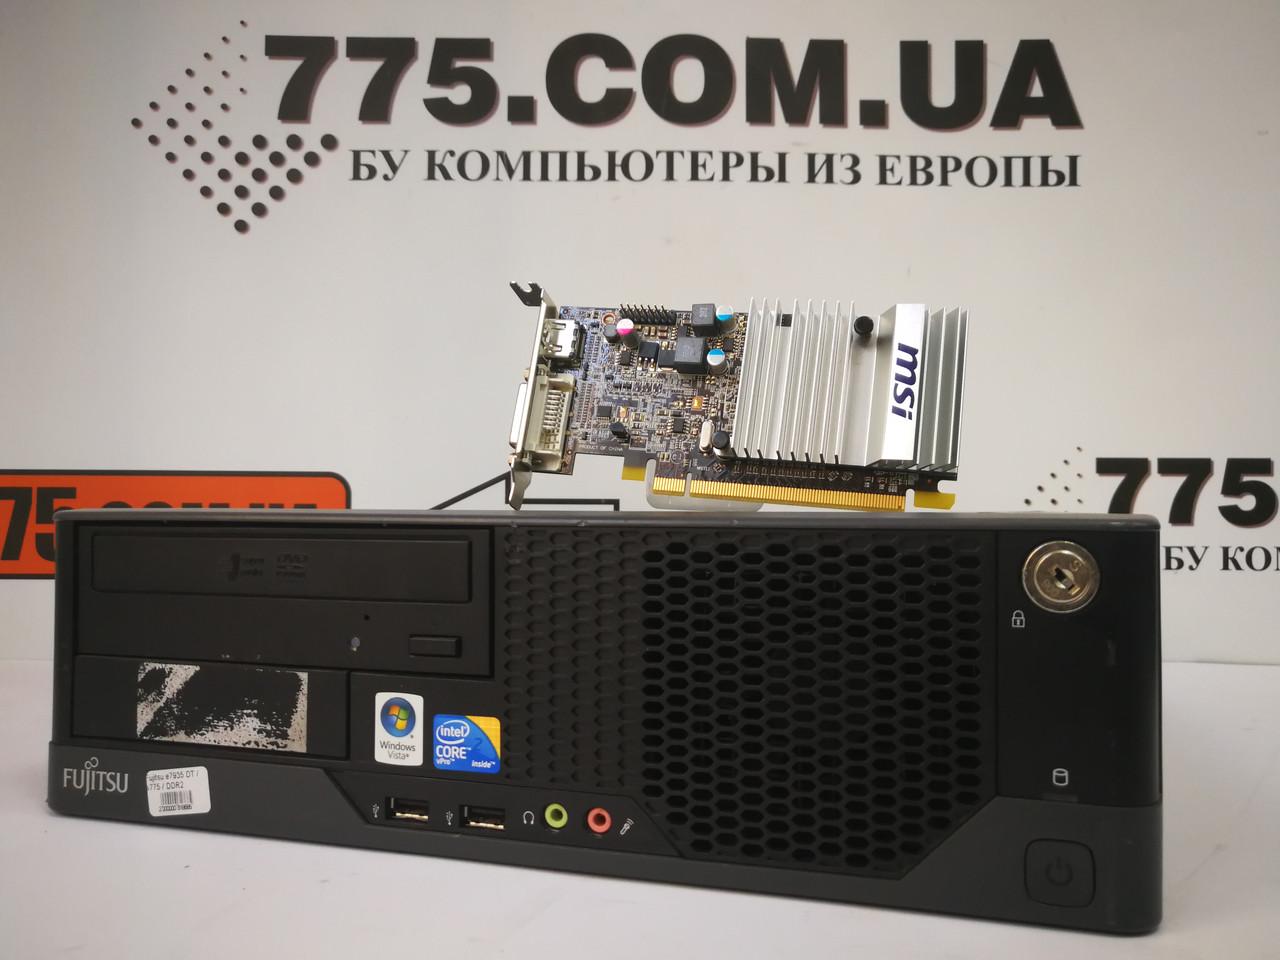 Игровой компьютер Fujitsu, Intel Core2Quad Q8200 2.33GHz (4 ядра), RAM 8ГБ, SSD 240ГБ(SSHD 500ГБ), HD 5450 1GB